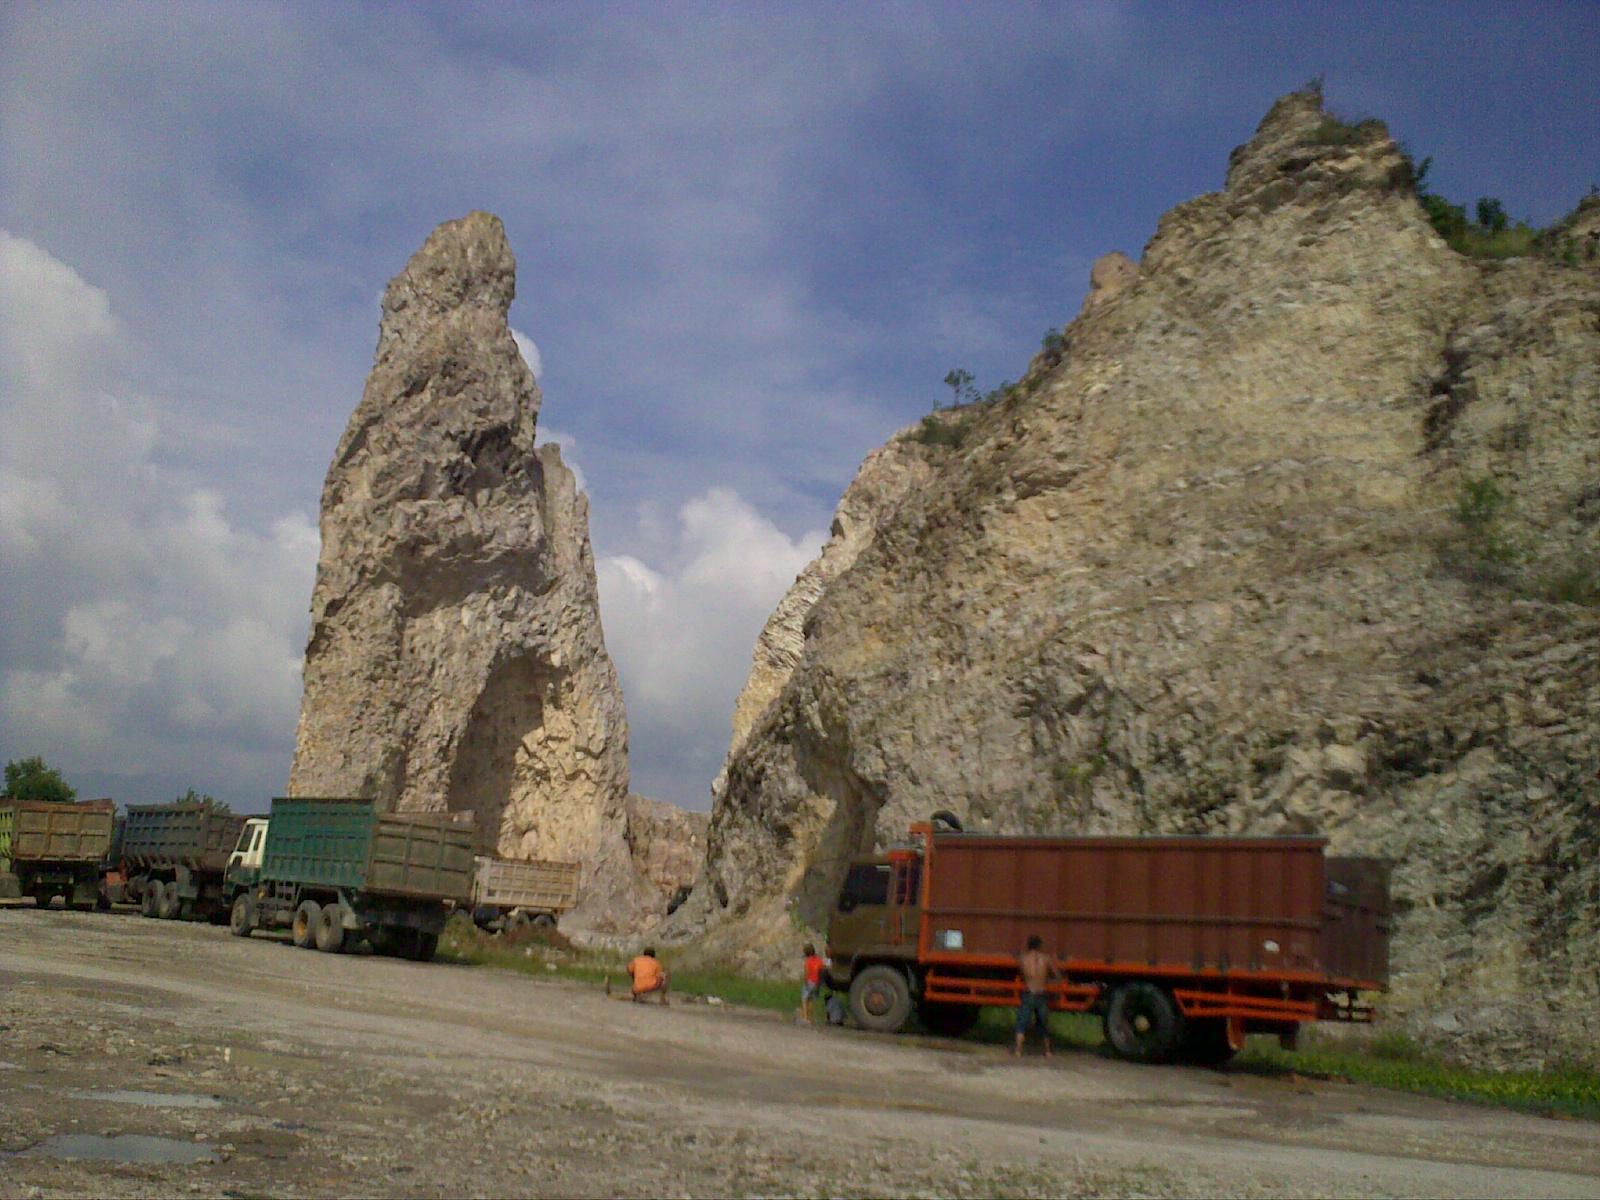 Menjadi Ibu Oktober 2010 Memasuki Pulau Sumatera Terbayang Hutannya Beda